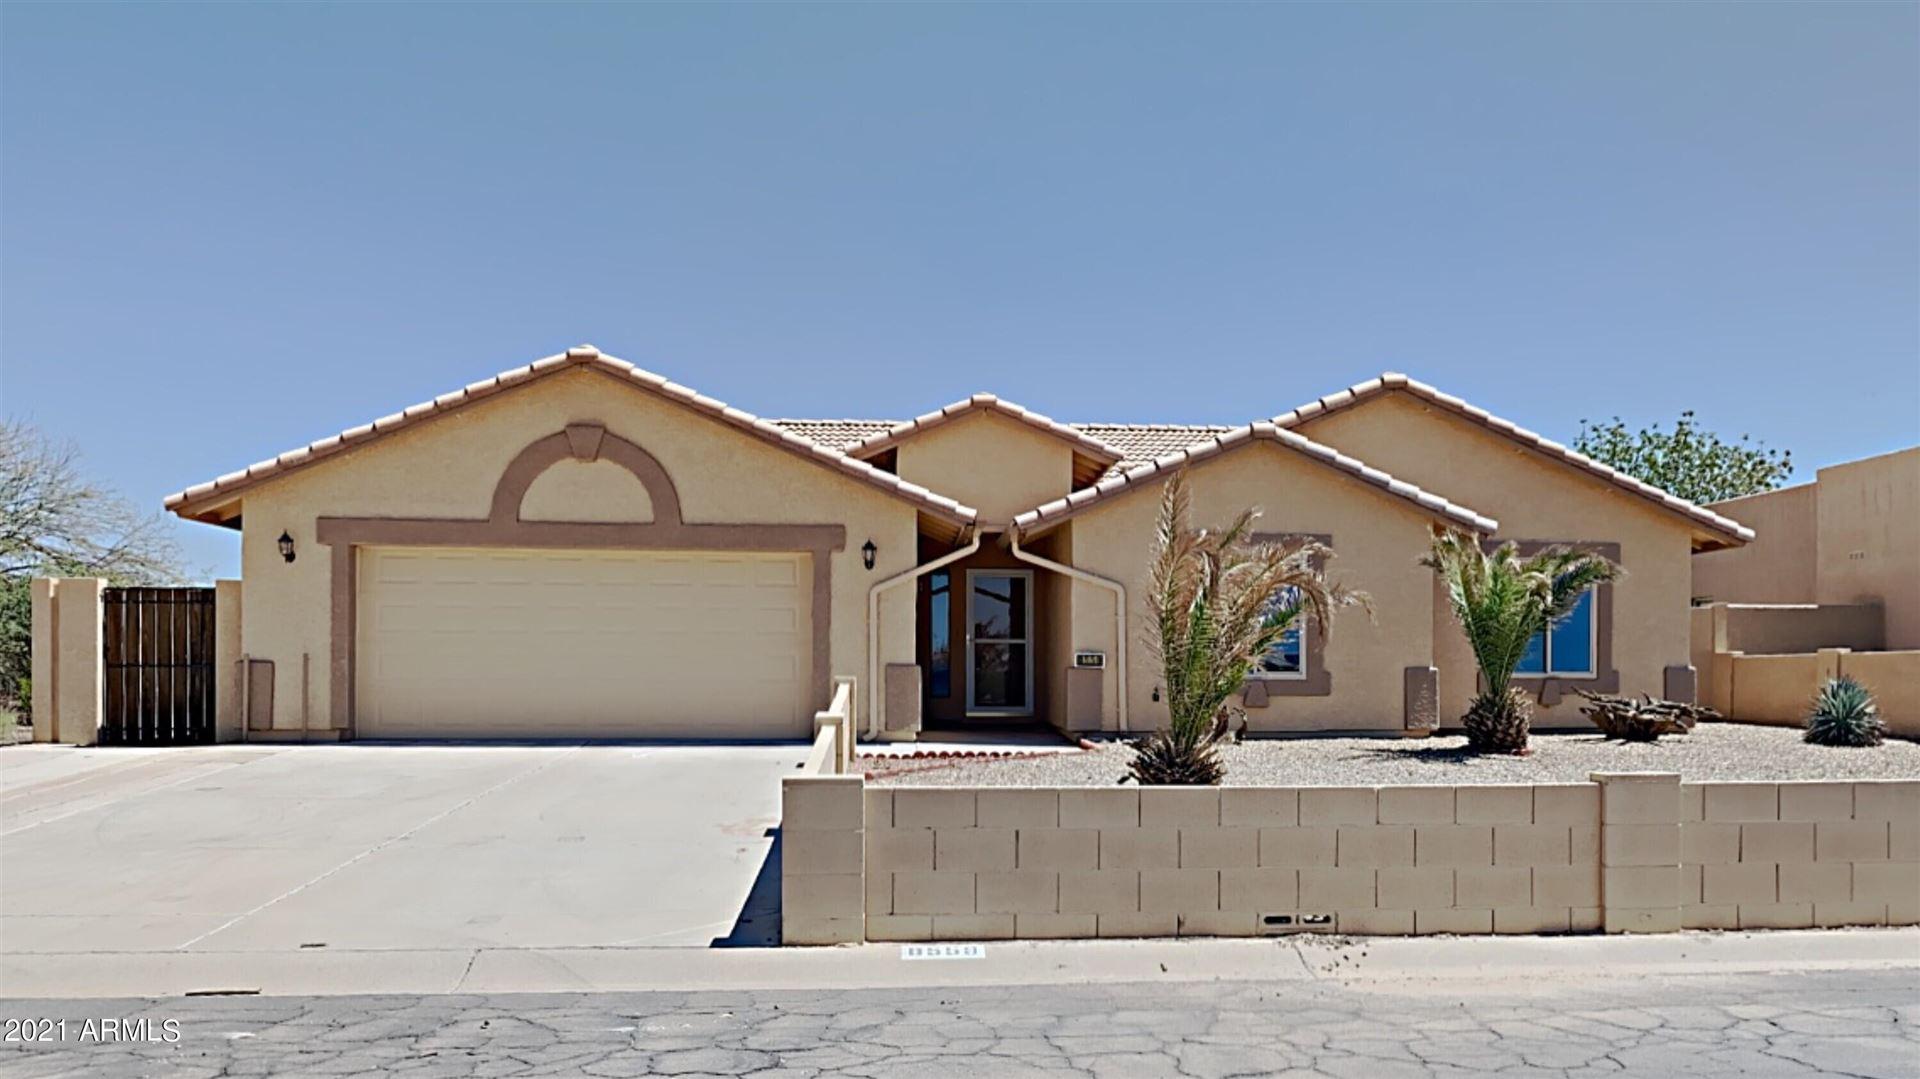 8559 W TORREON Drive, Arizona City, AZ 85123 - MLS#: 6290663